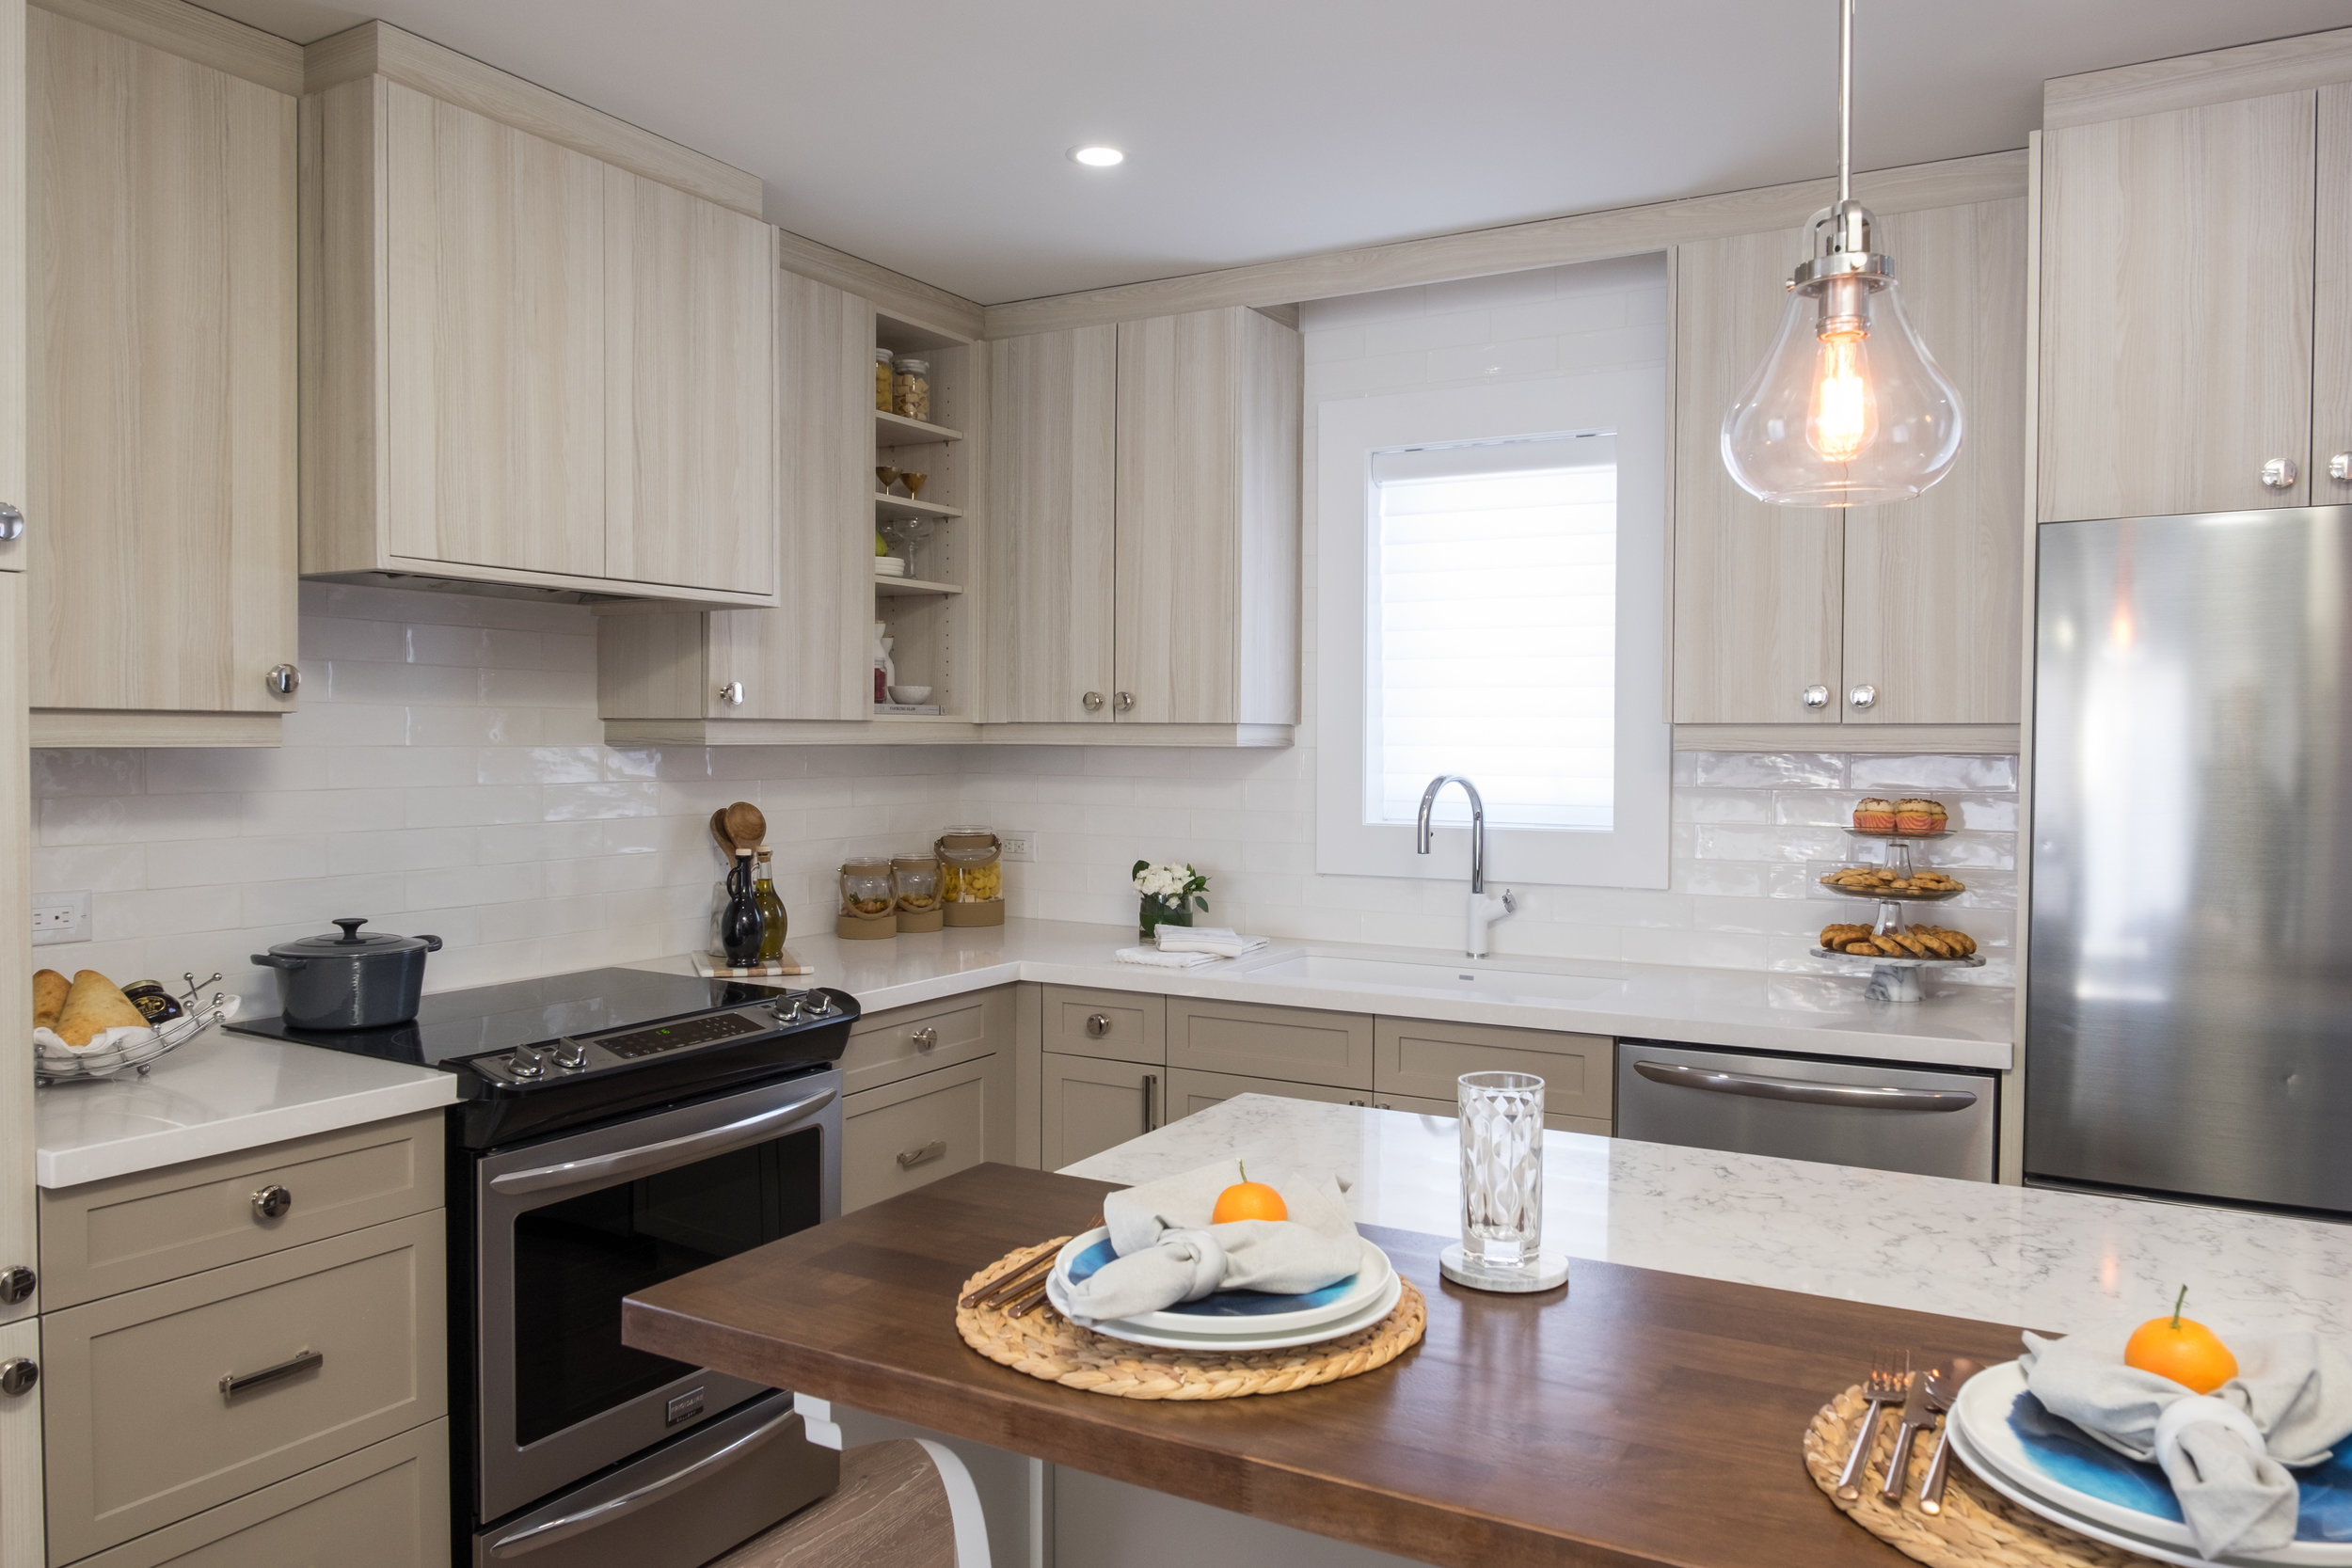 413_Kitchen_Cabinetry.jpg